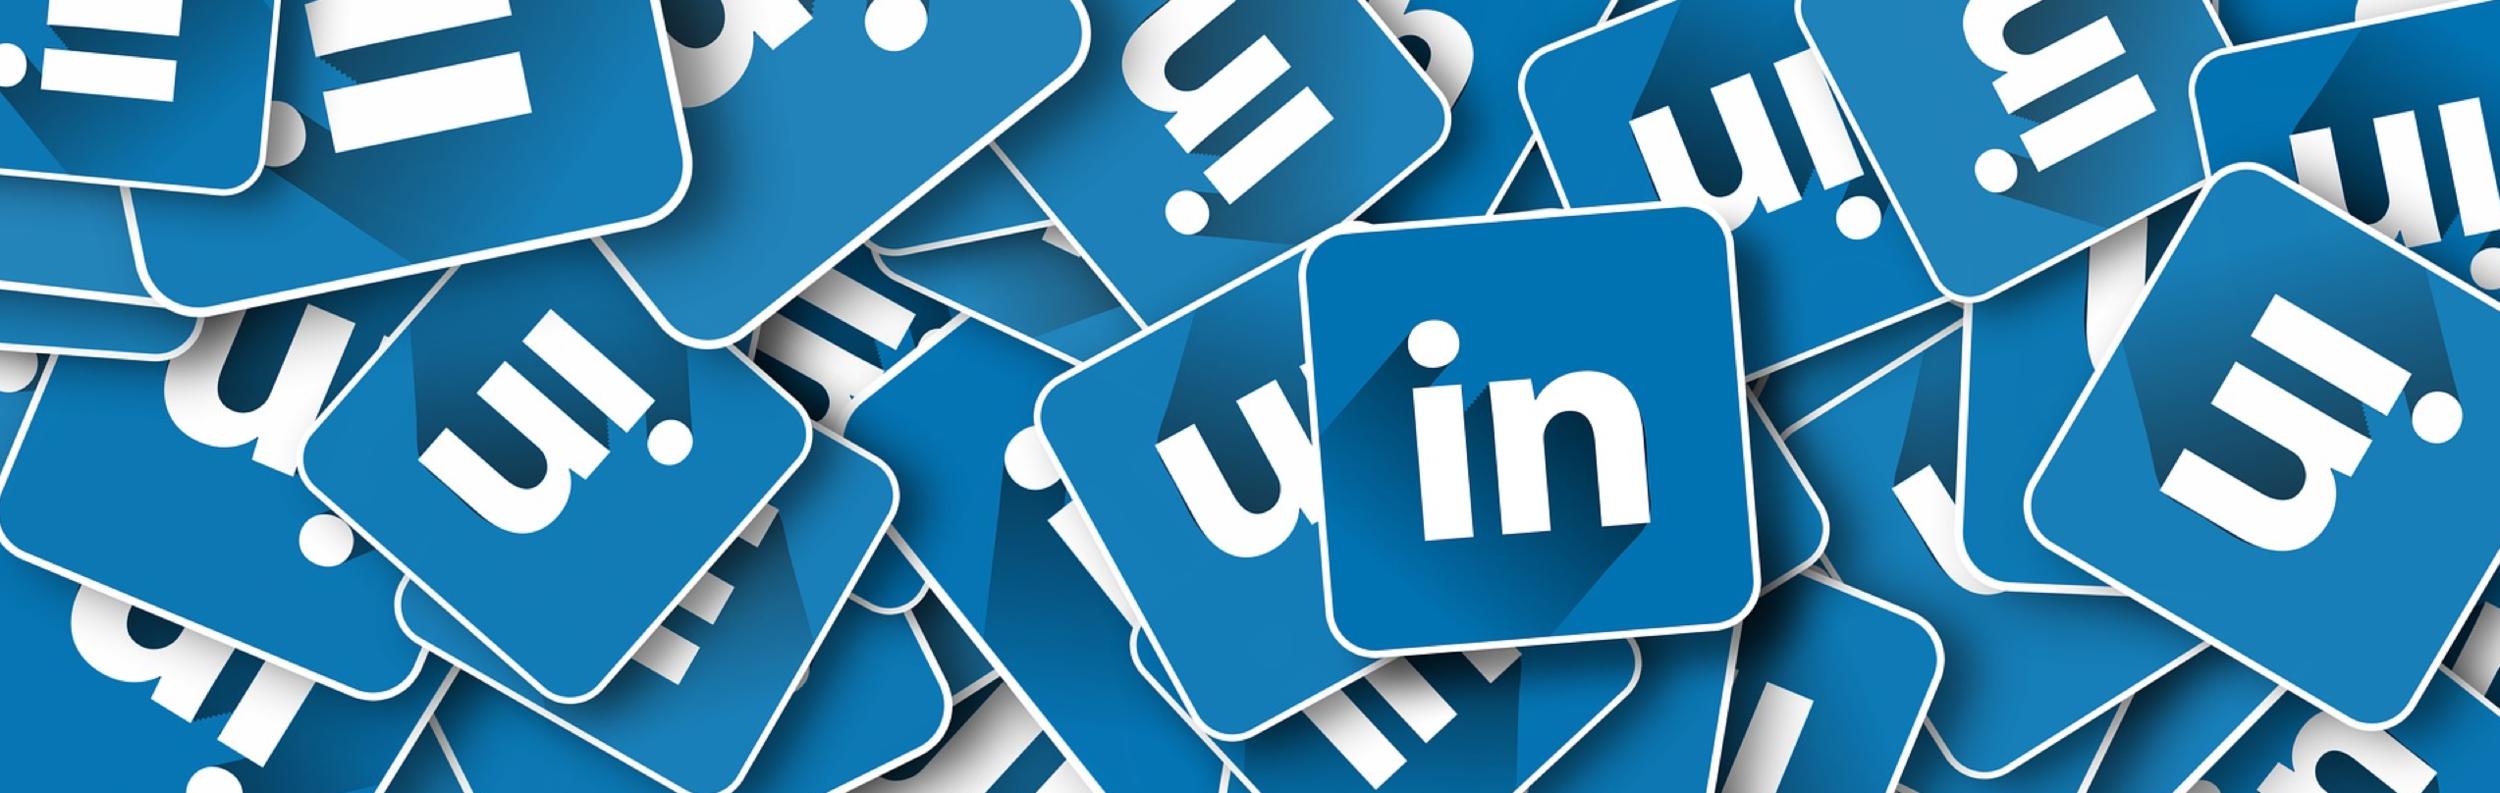 Join us on LinkedIn ! -